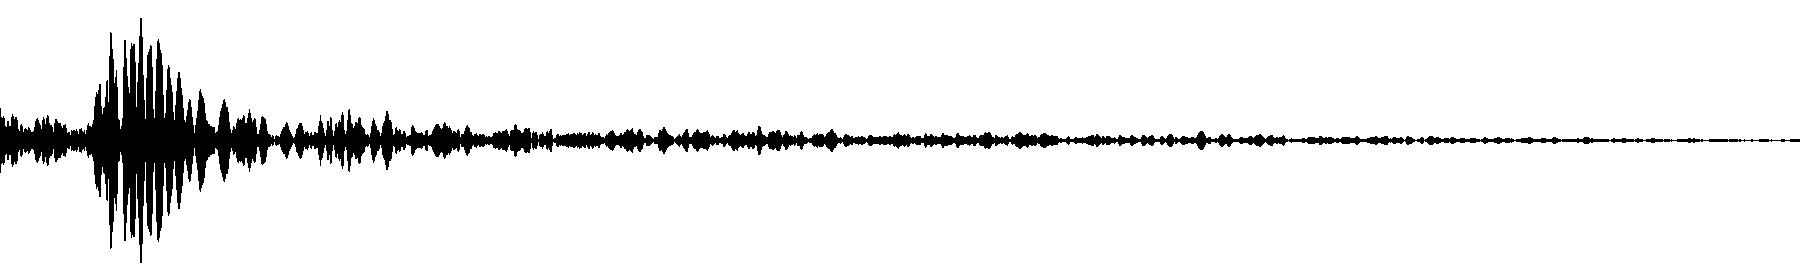 biab glitchhop blip 16